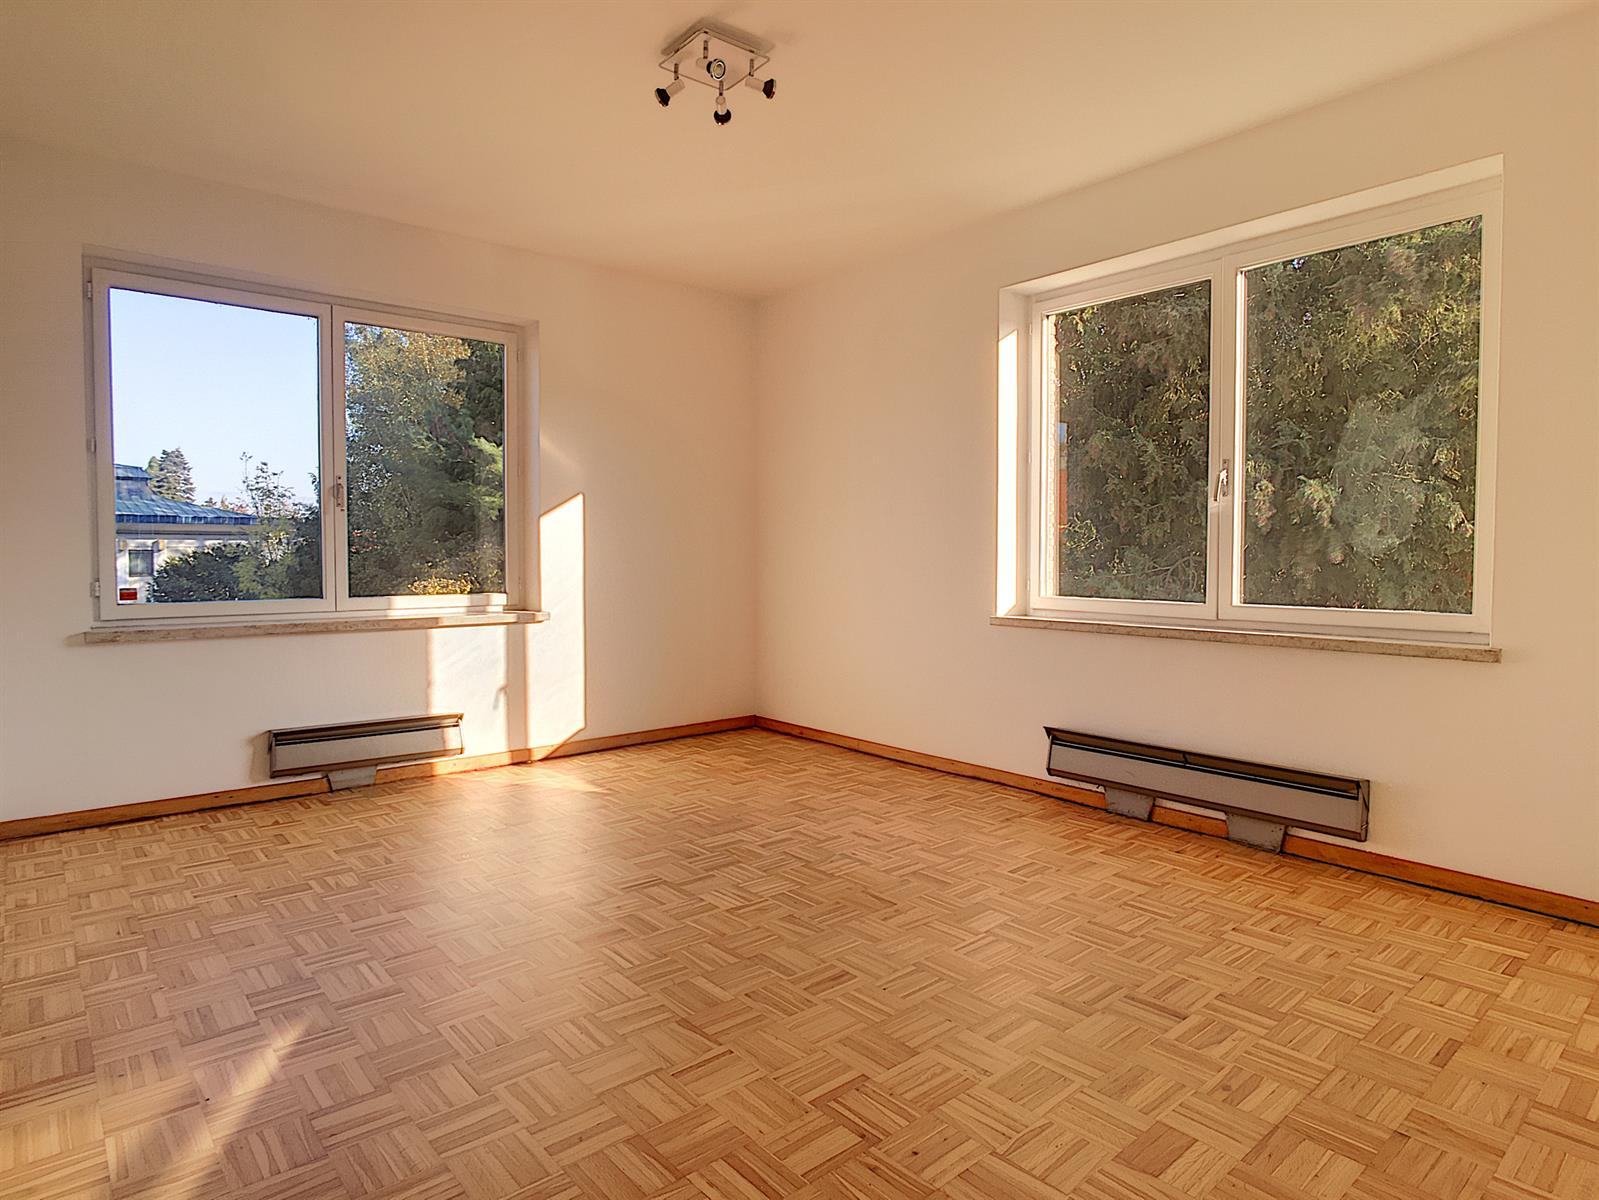 Appartement - Auderghem - #4197560-5